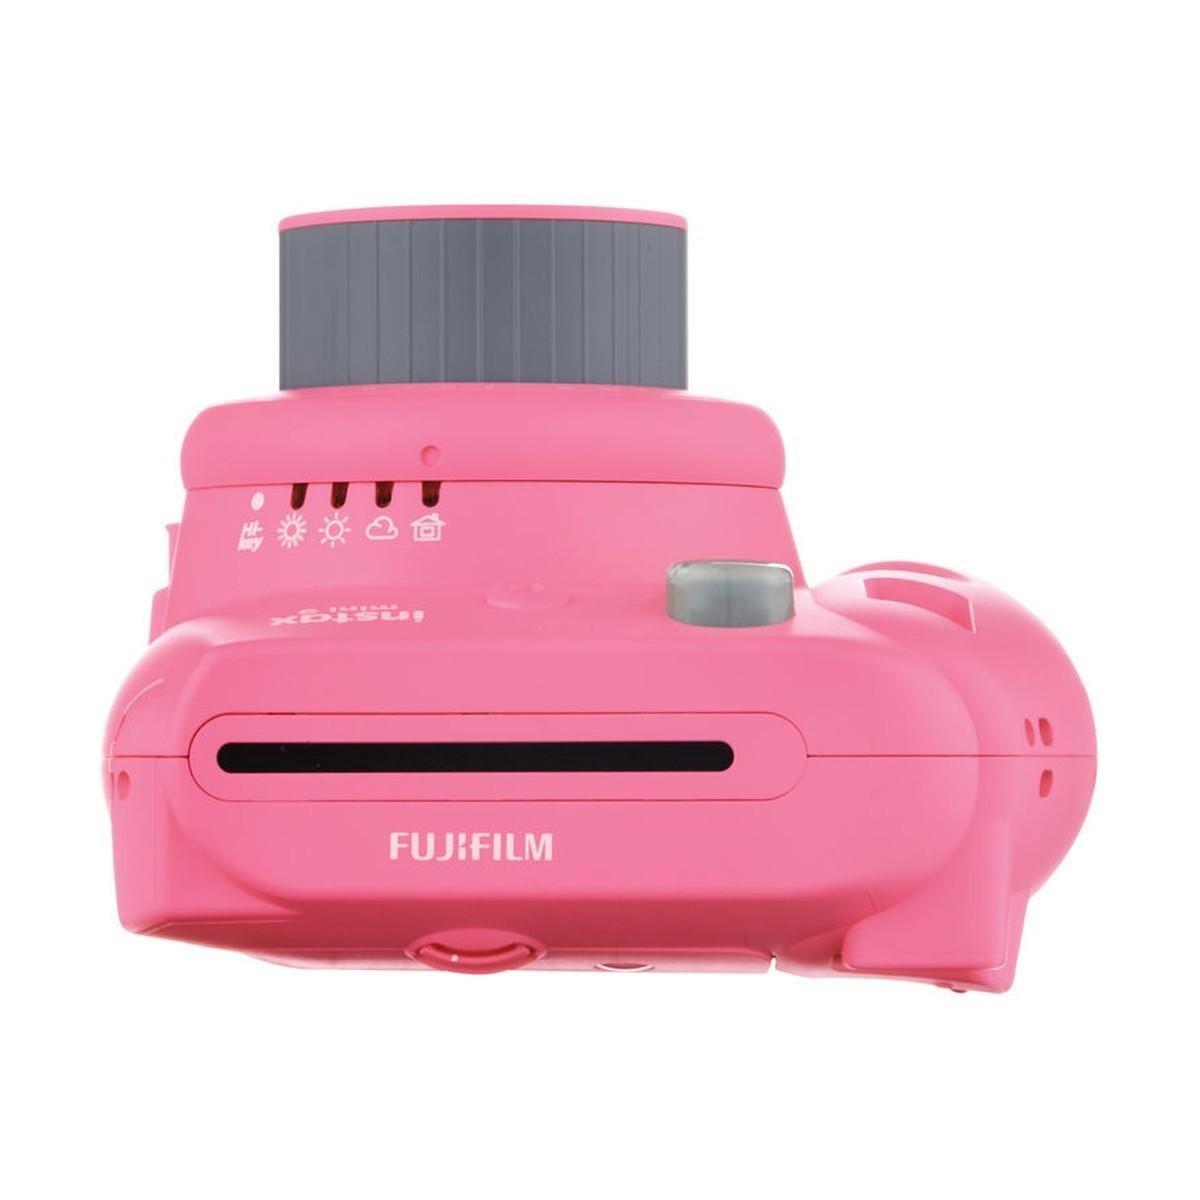 fujifilm instax mini 9 camera 10 shots free flamingo. Black Bedroom Furniture Sets. Home Design Ideas